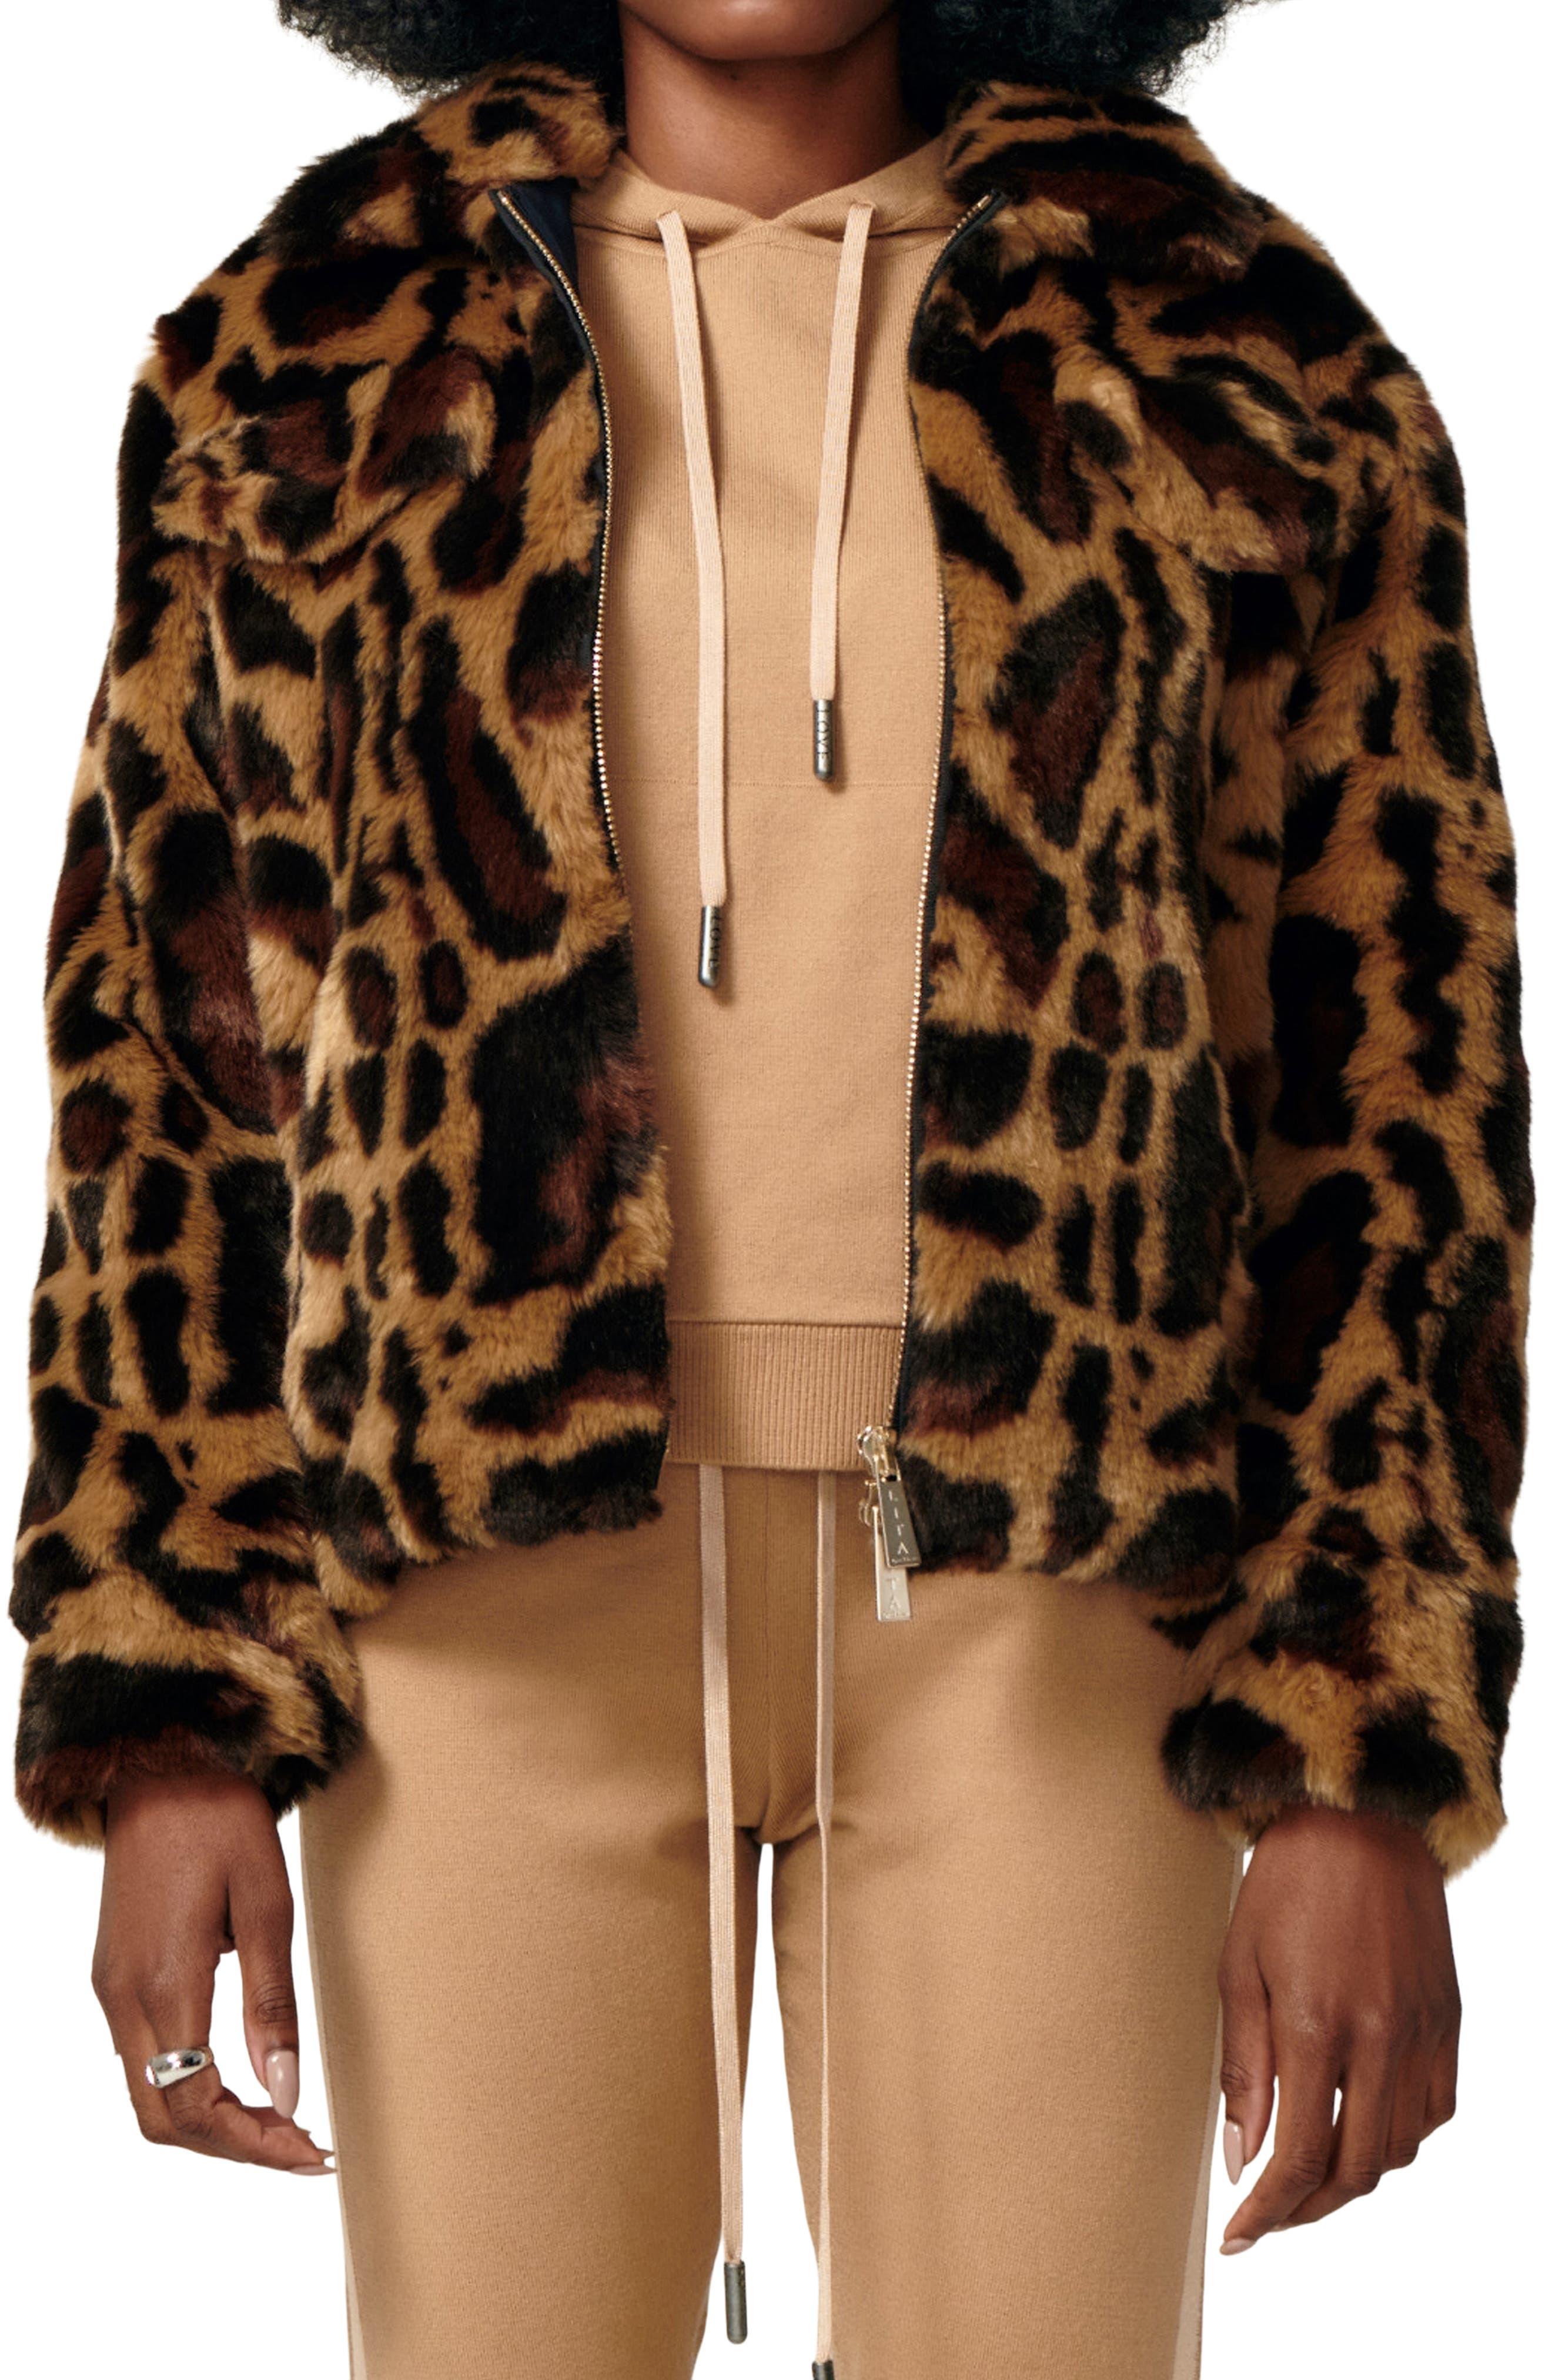 Wildcat Faux Fur Jacket